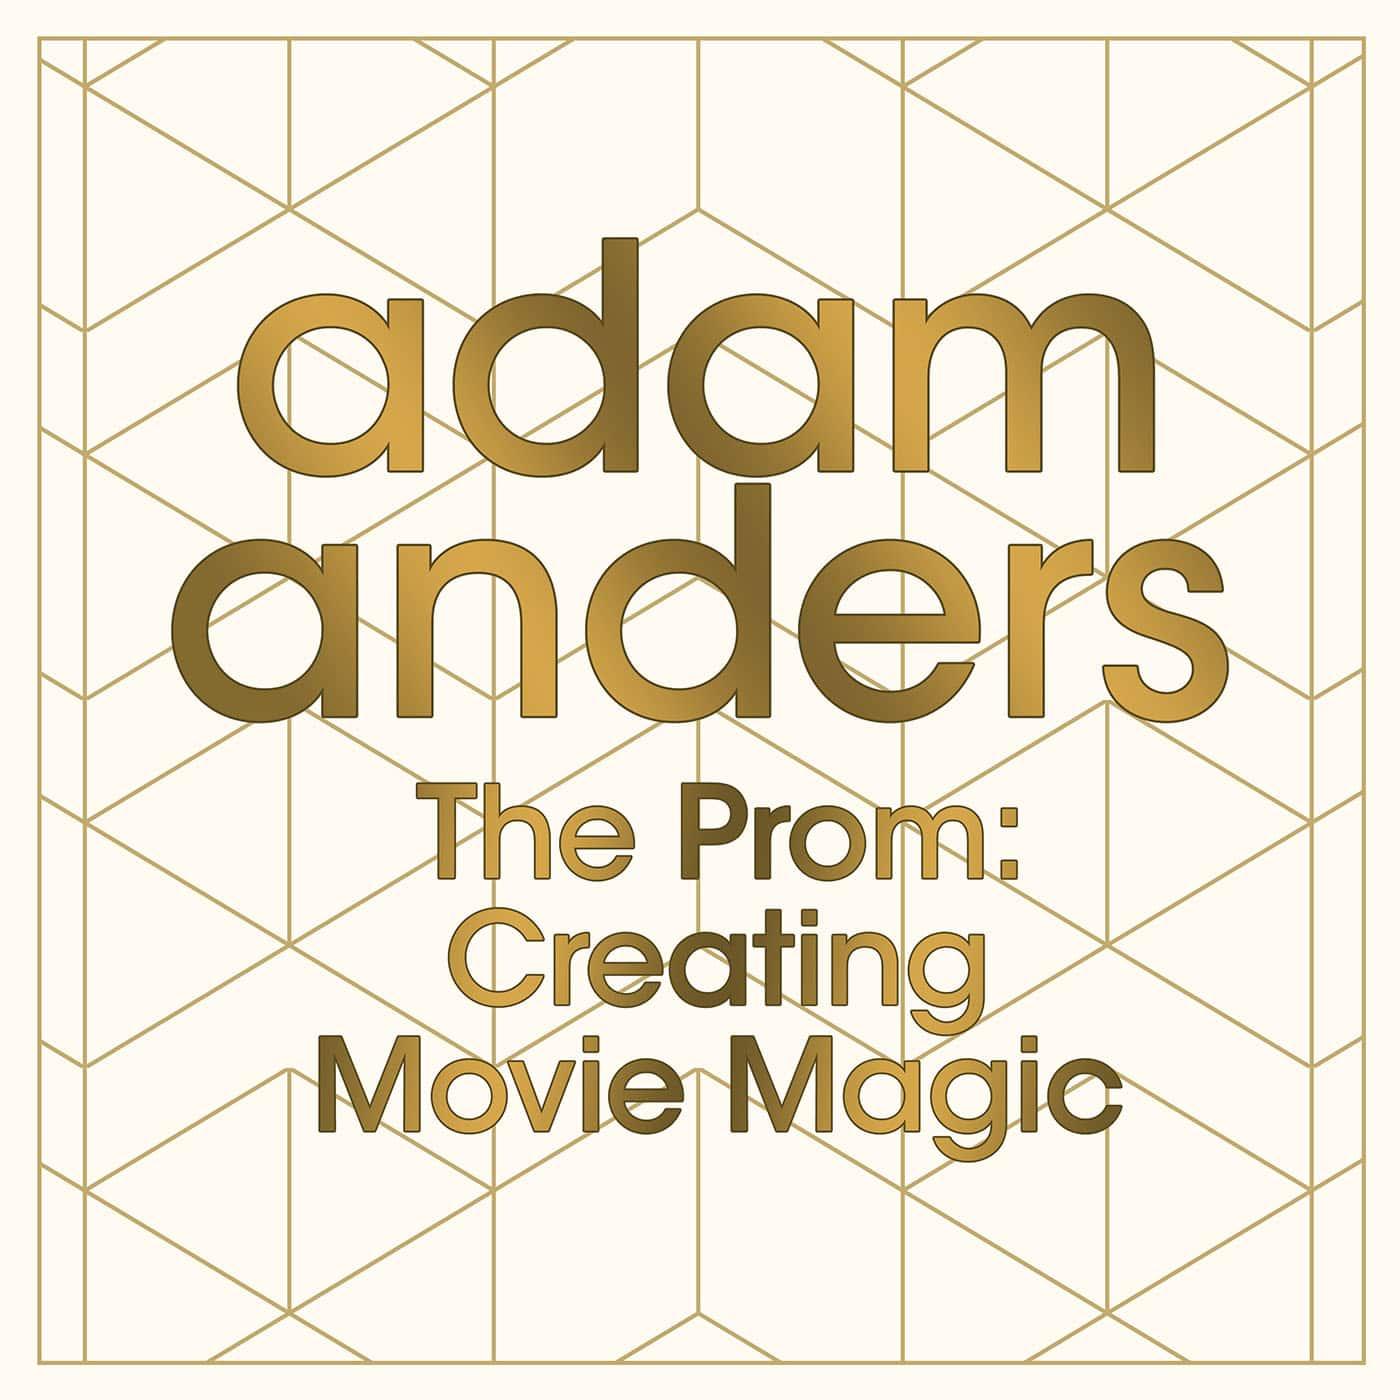 The Prom: Creating Movie Magic